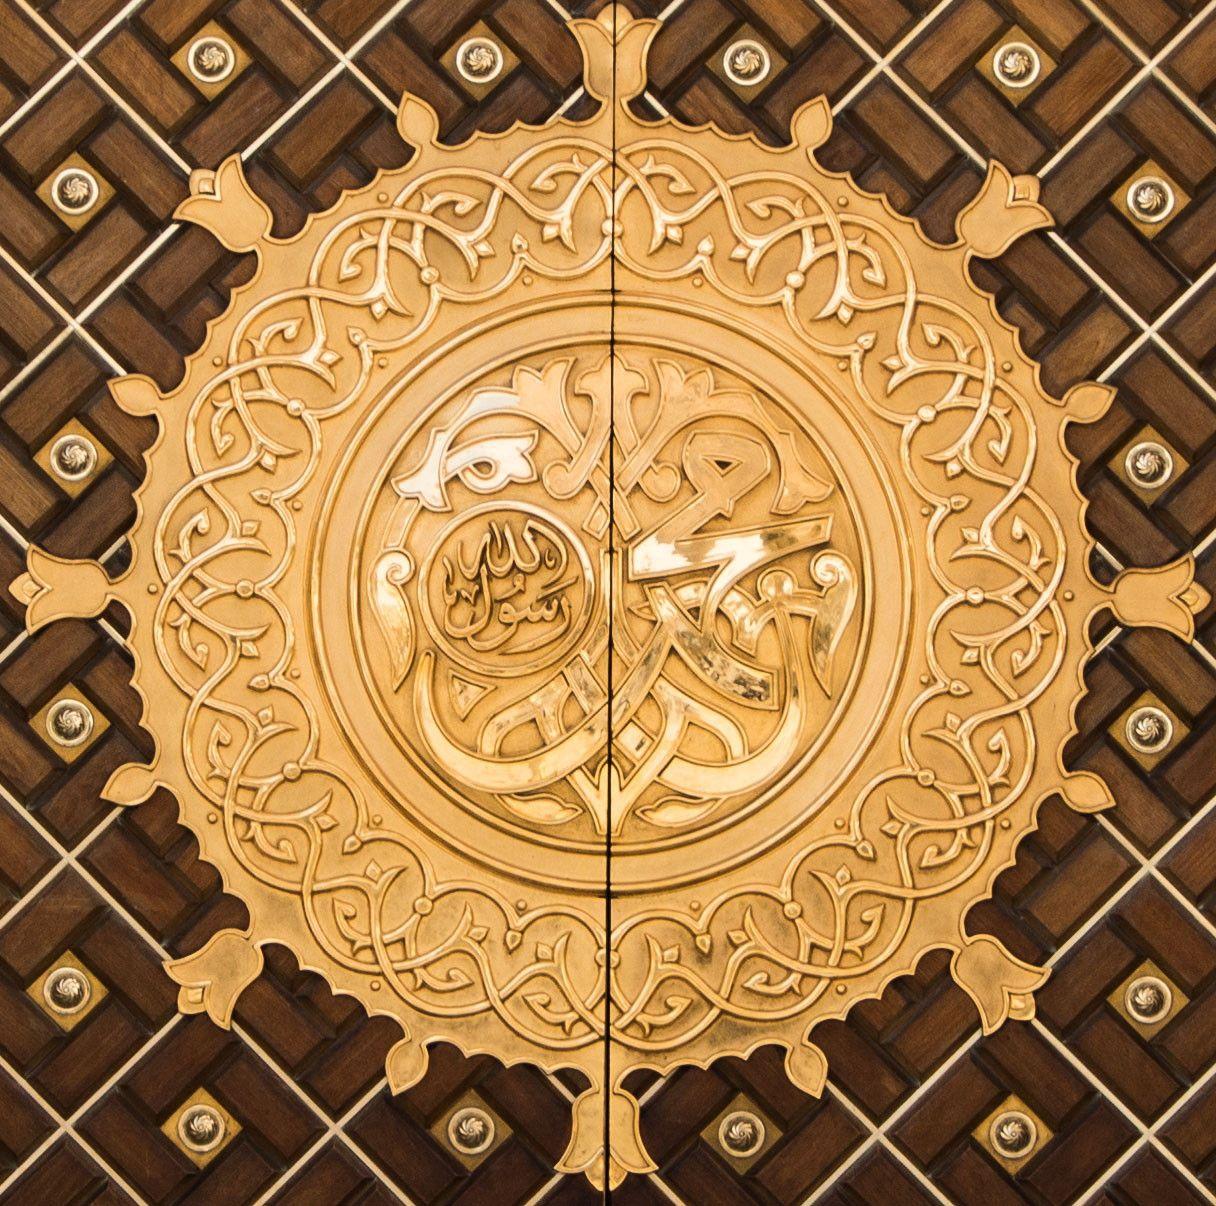 Door of Masjid Nabawi on Saudi Arabia  sc 1 st  Pinterest & Door of Masjid Nabawi on Saudi Arabia | Islamic art | Pinterest ...